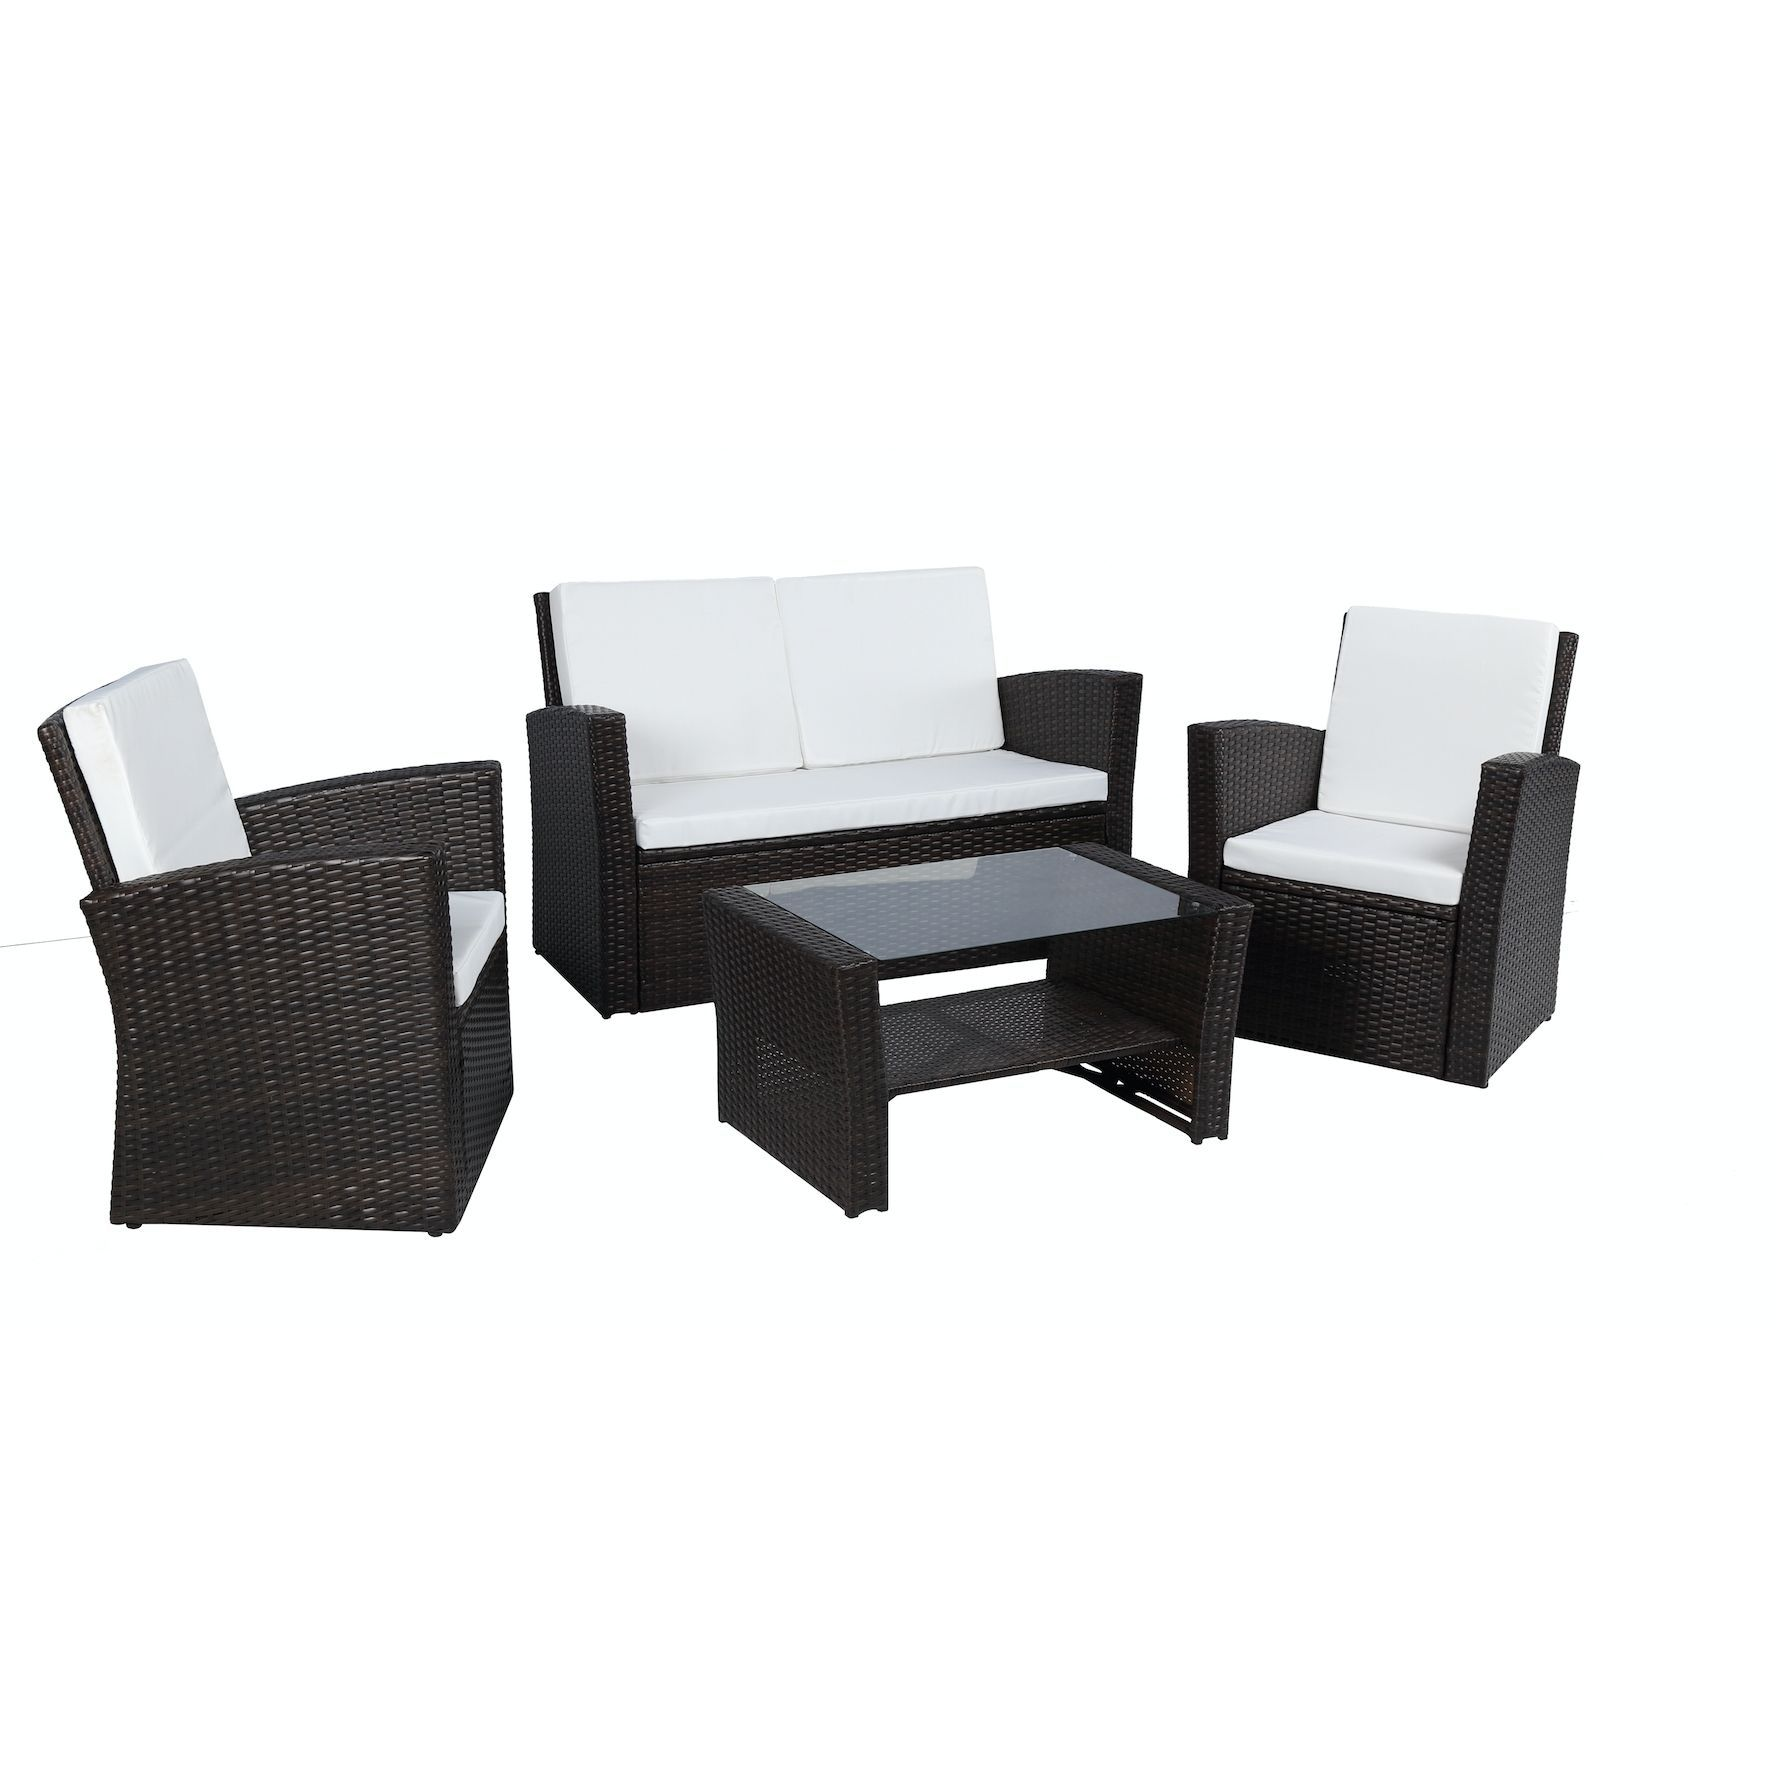 Brilliant International Baner Garden Outdoor Furniture Complete Patio Home Interior And Landscaping Ologienasavecom